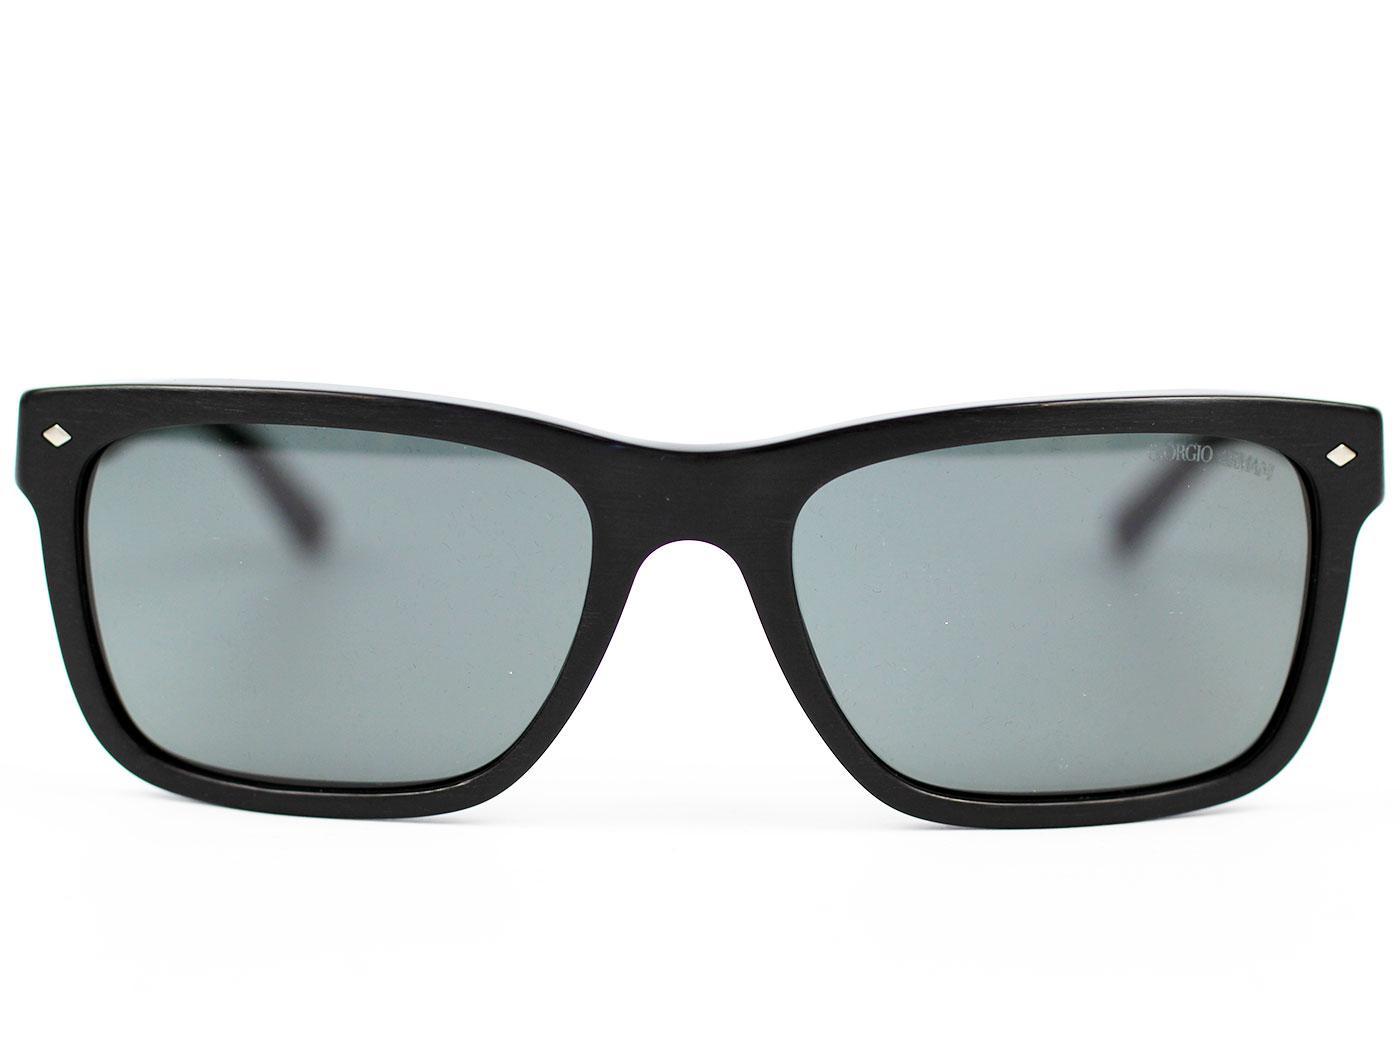 3f1155a53 Giorgio Armani Retro Mod Brushed Frame Wayfarer Sunglasses Black